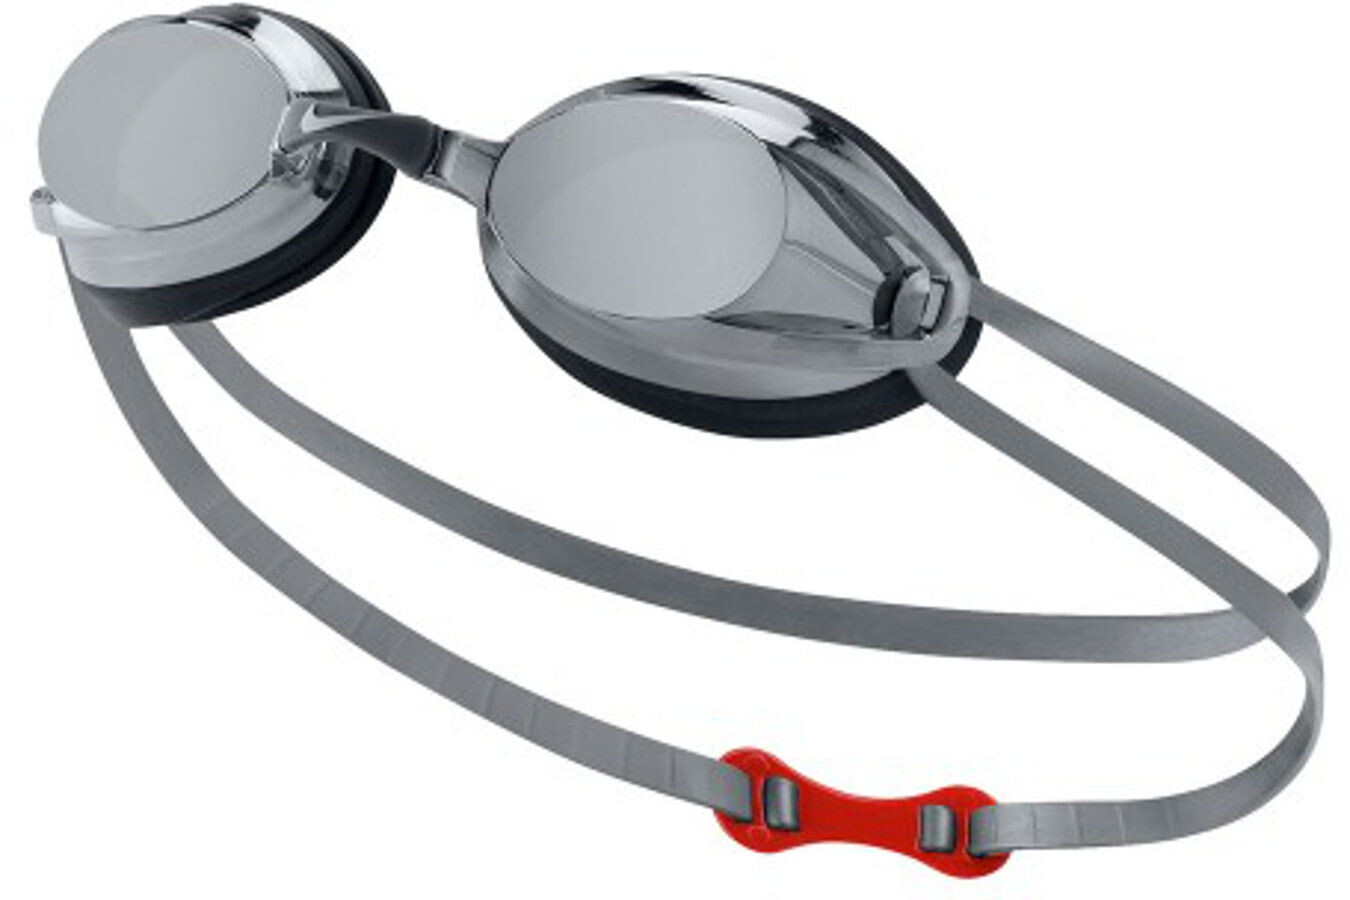 Nike Swim Remora Mirrored Simglasögon grå silver - till fenomenalt ... 4591a23c556cb